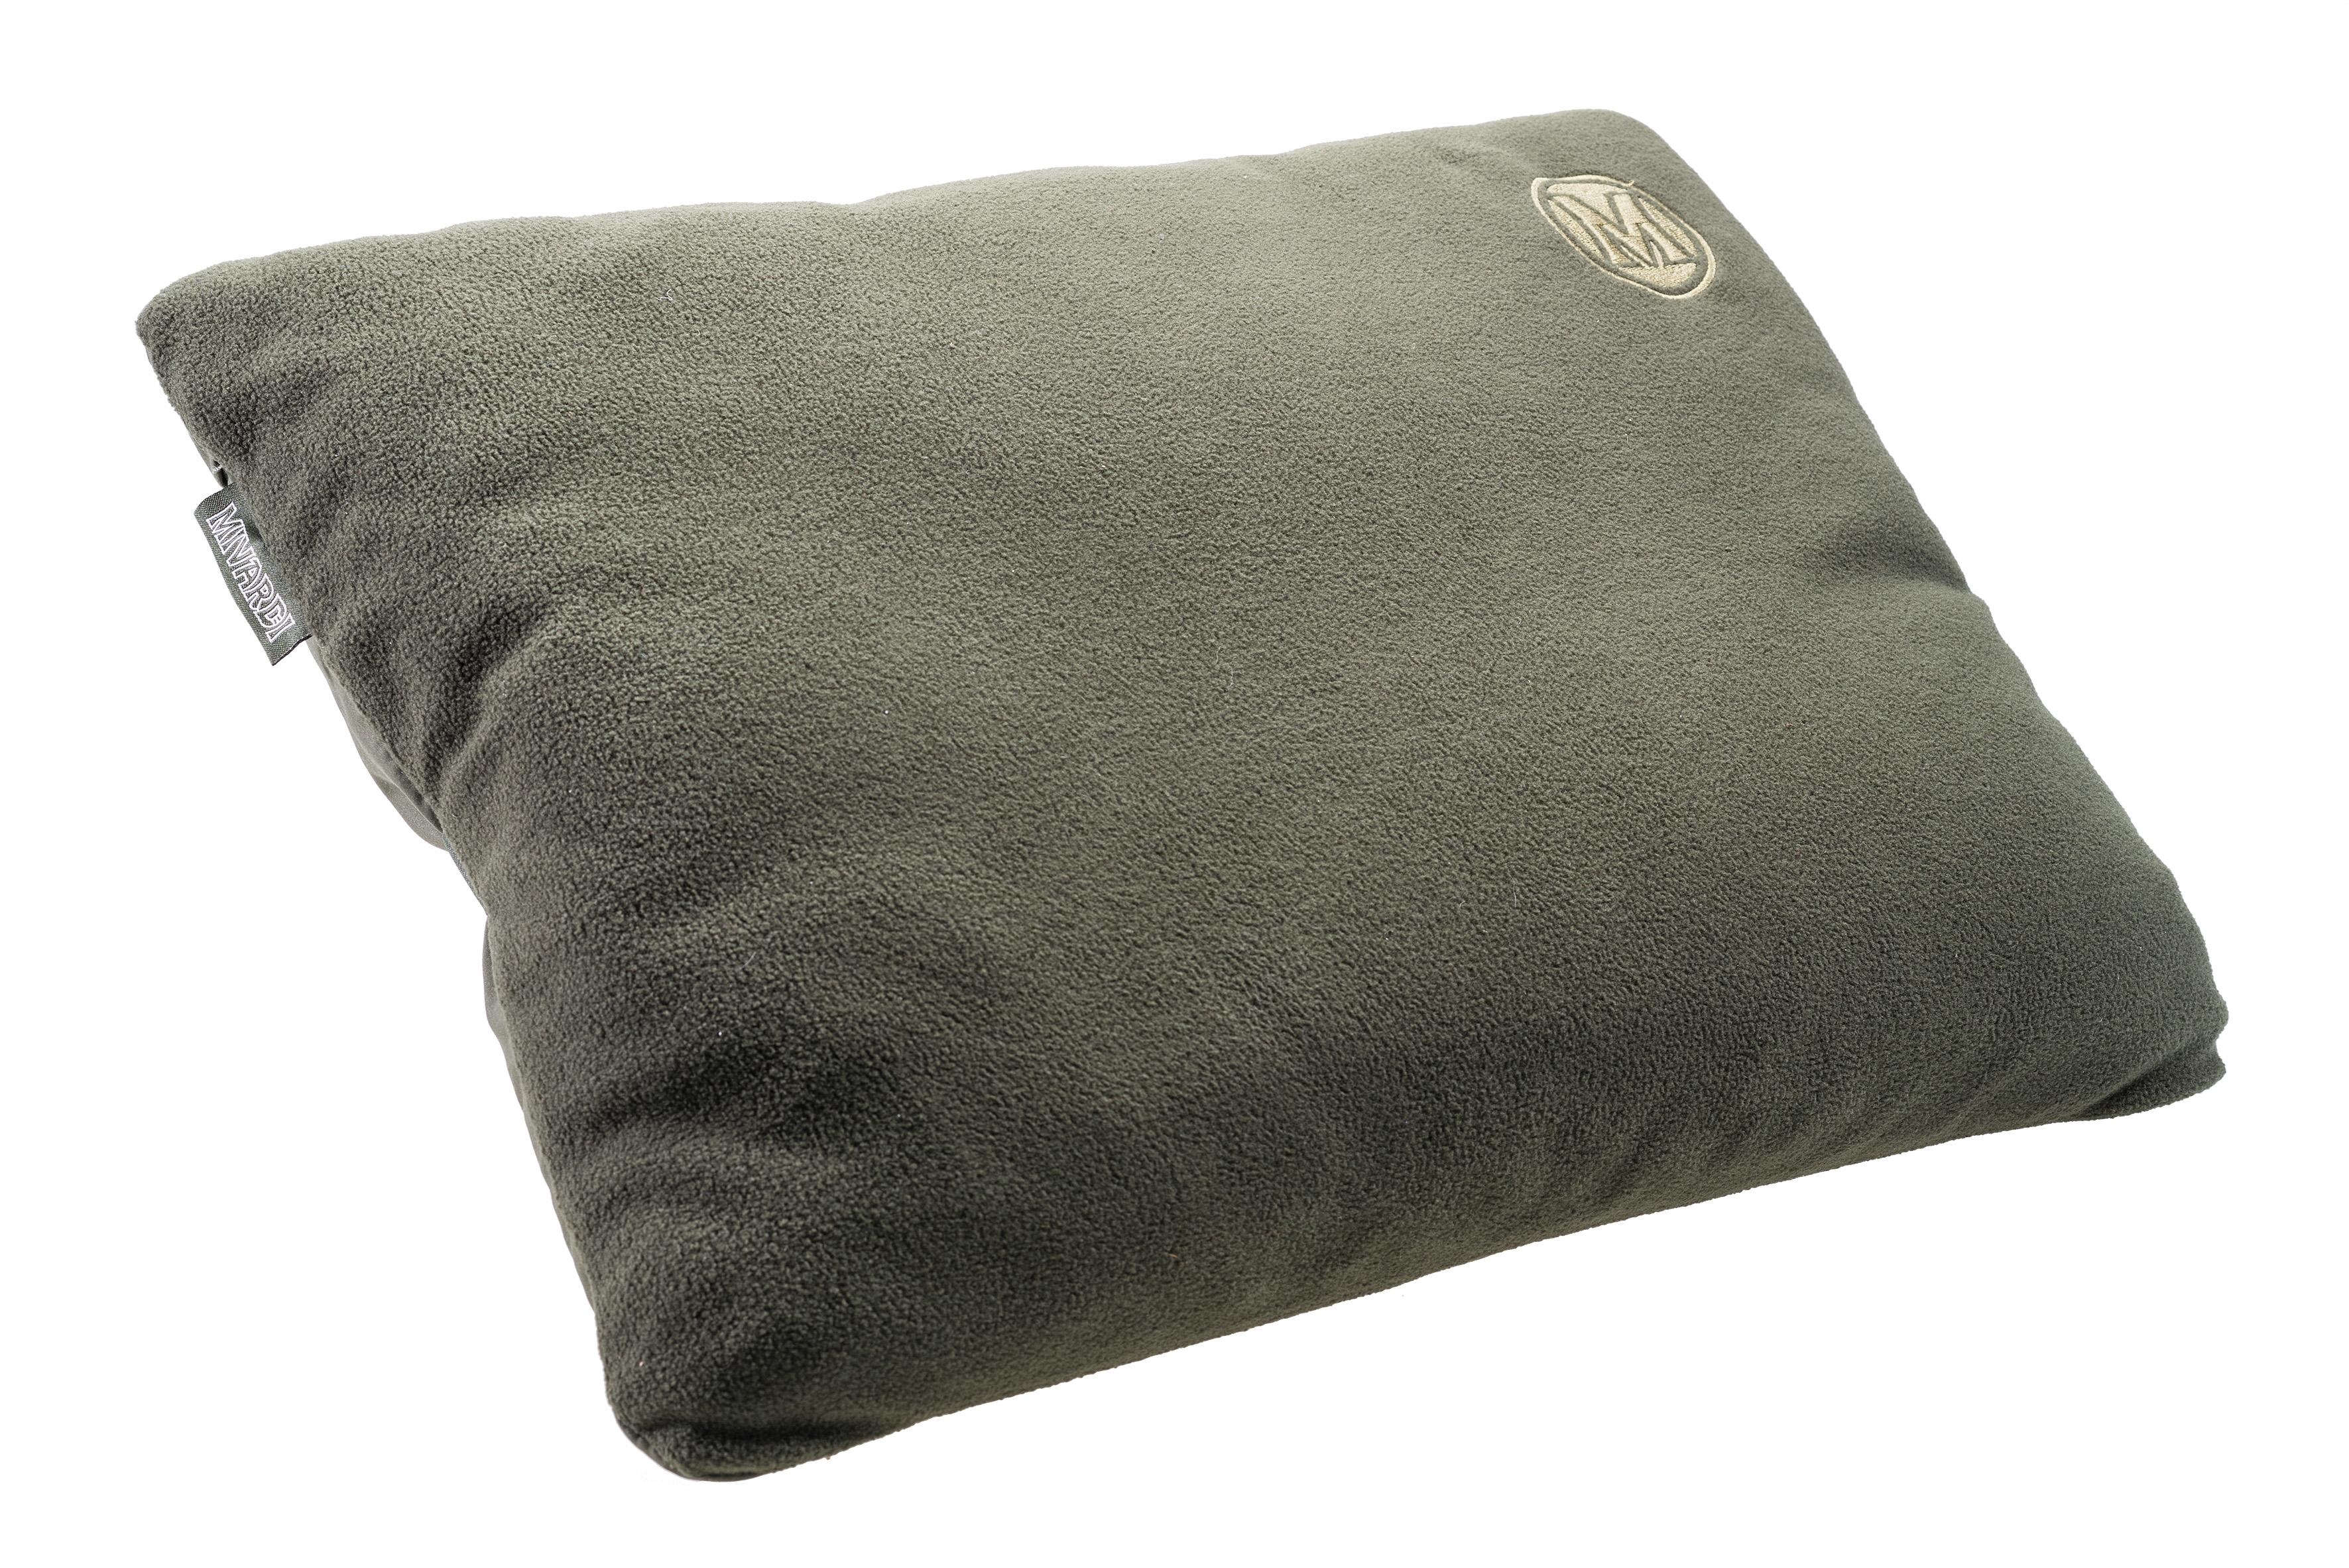 M-PINDXL Pillow New Dynasty XL